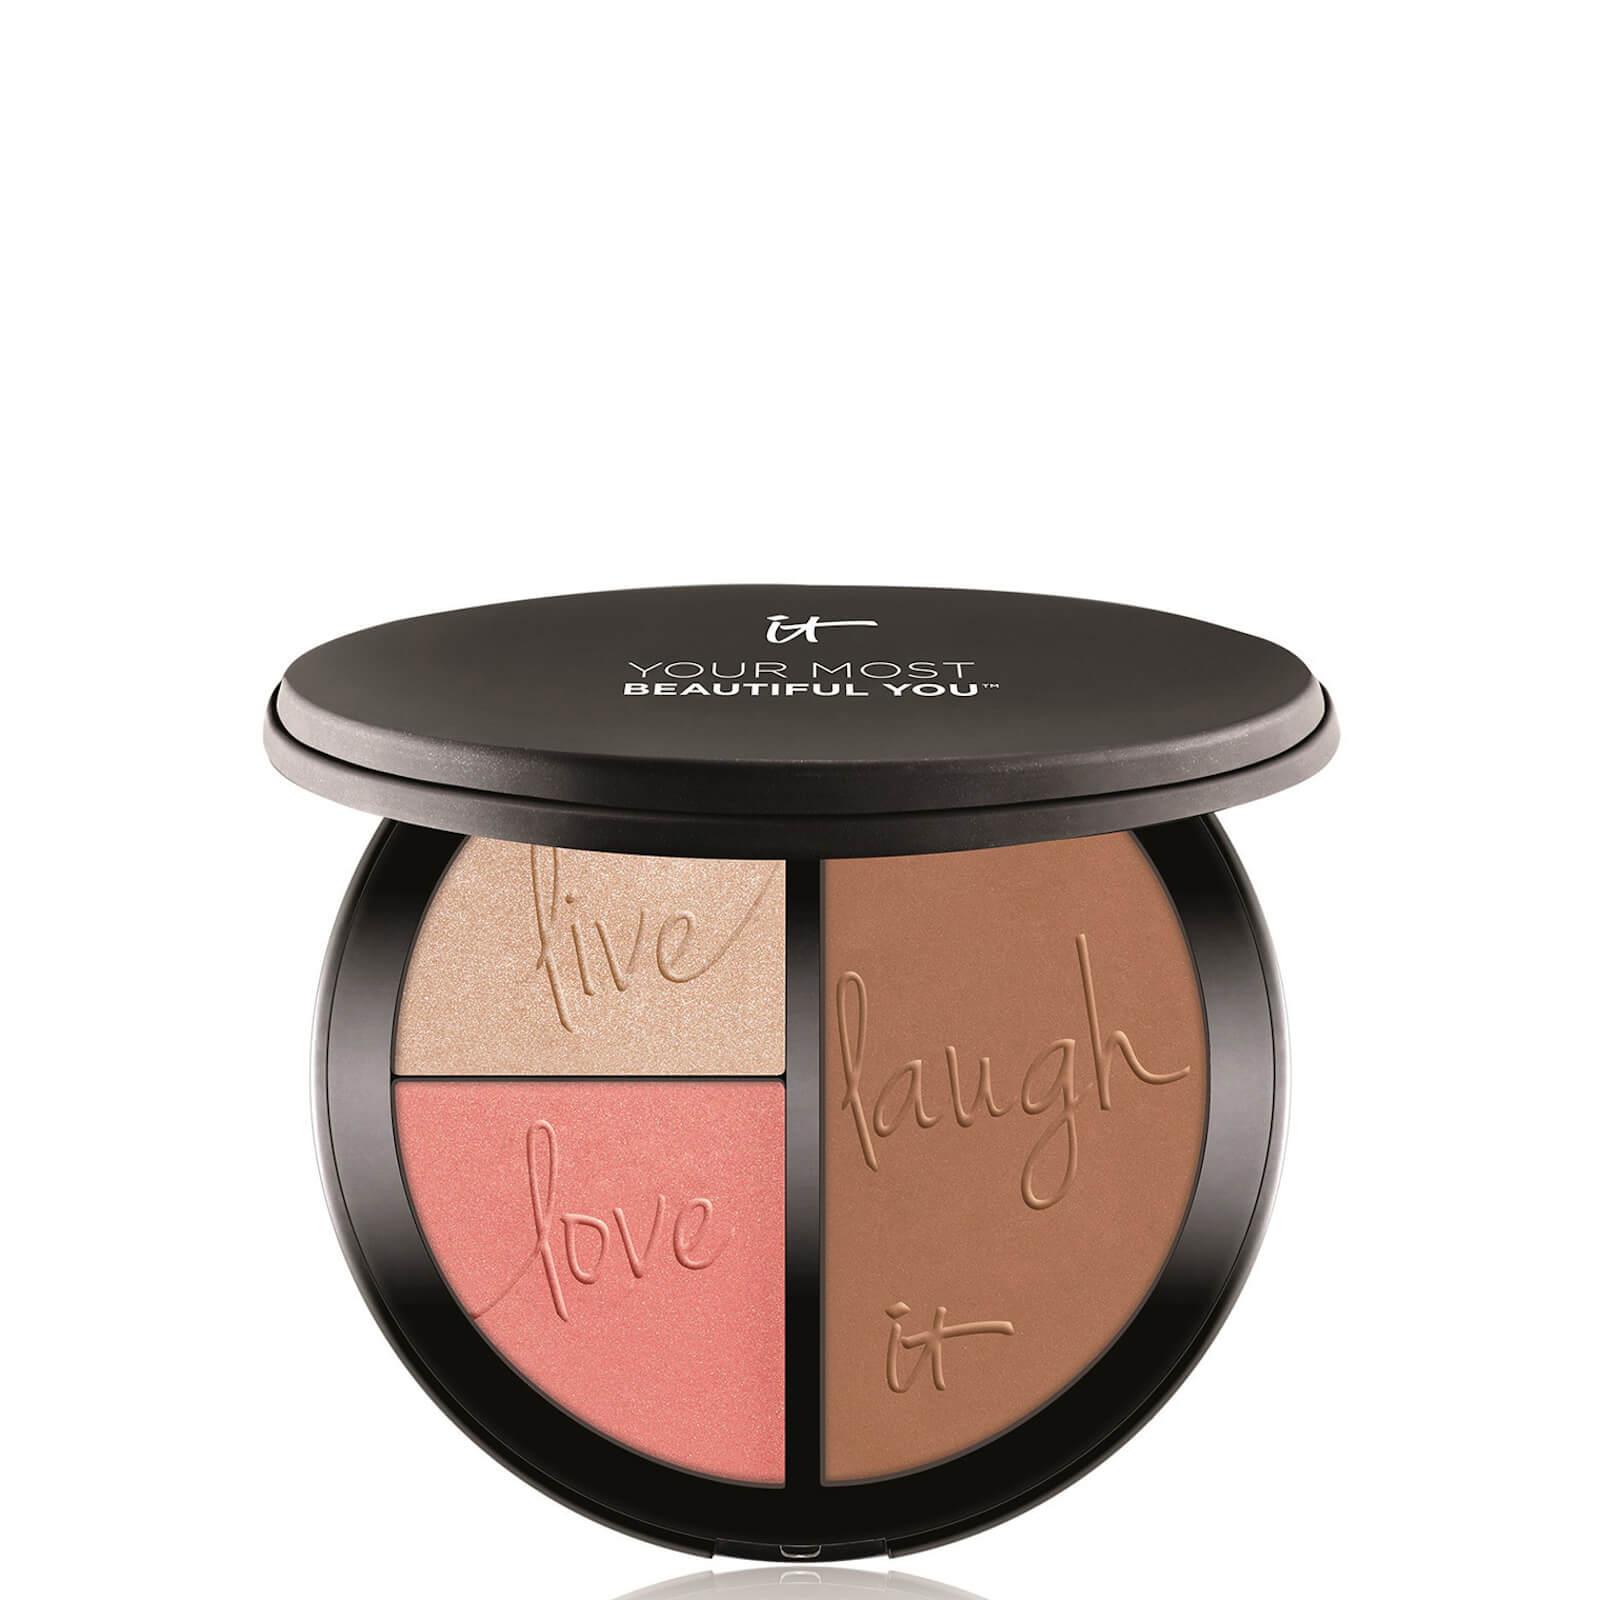 Купить IT Cosmetics Your Most Beautiful You Palette - Live, Laugh, Love 22.22g